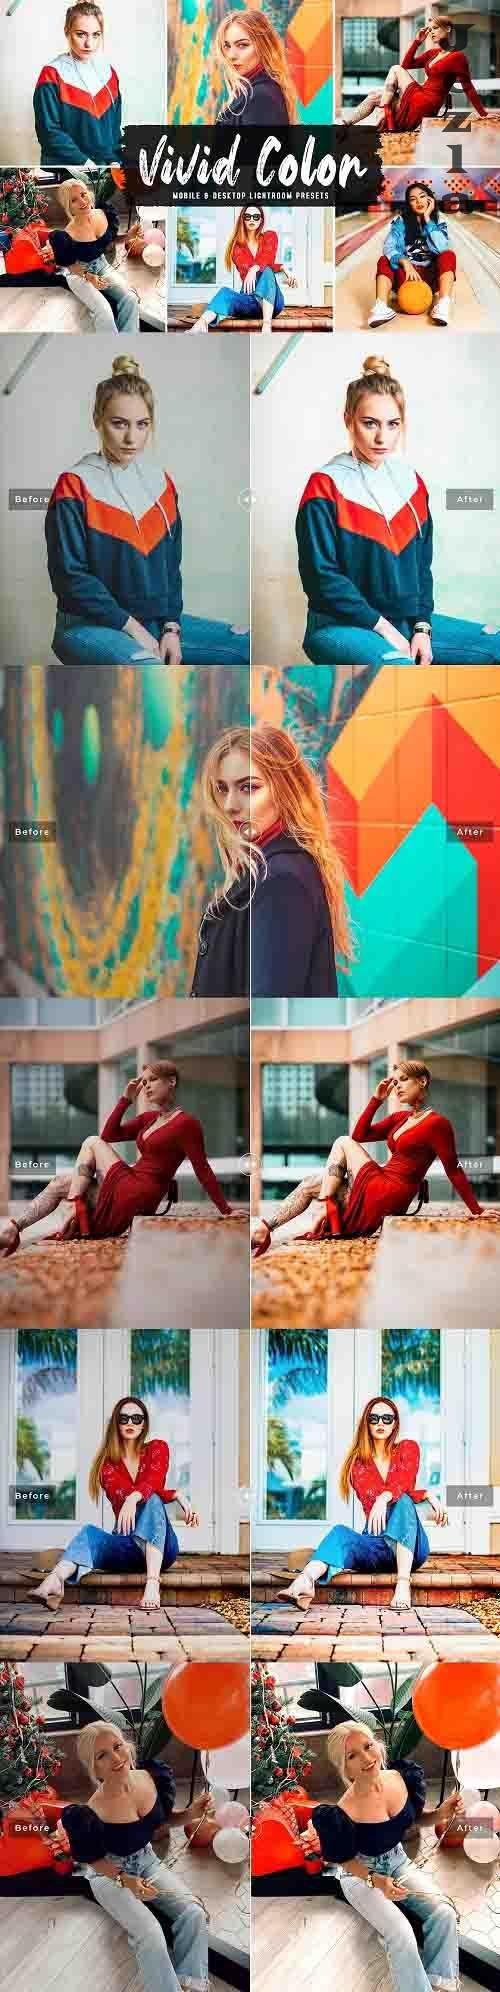 Vivid Color Pro Lightroom Presets - 6219349